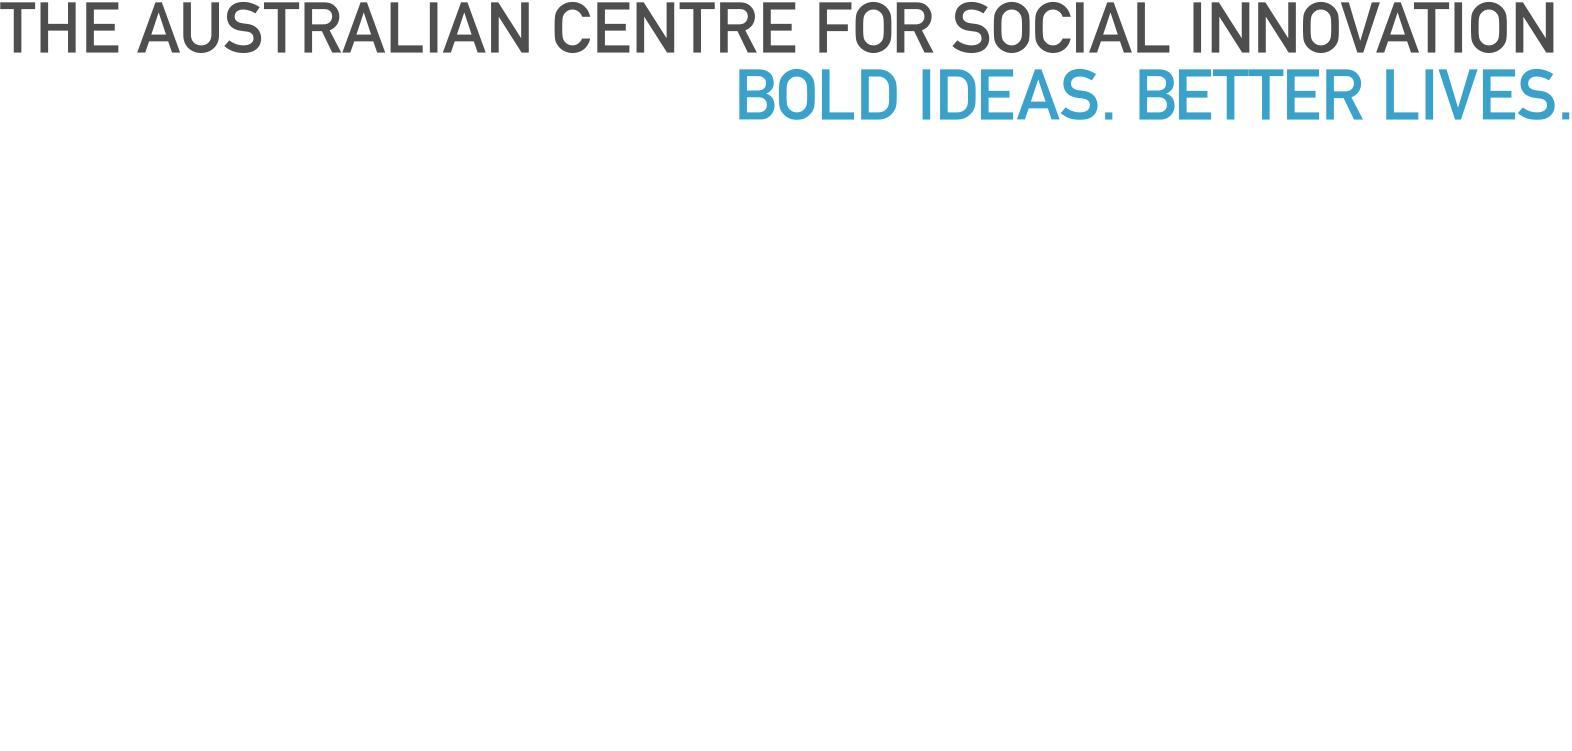 TACSI Logo - Bold Ideas Better Lives